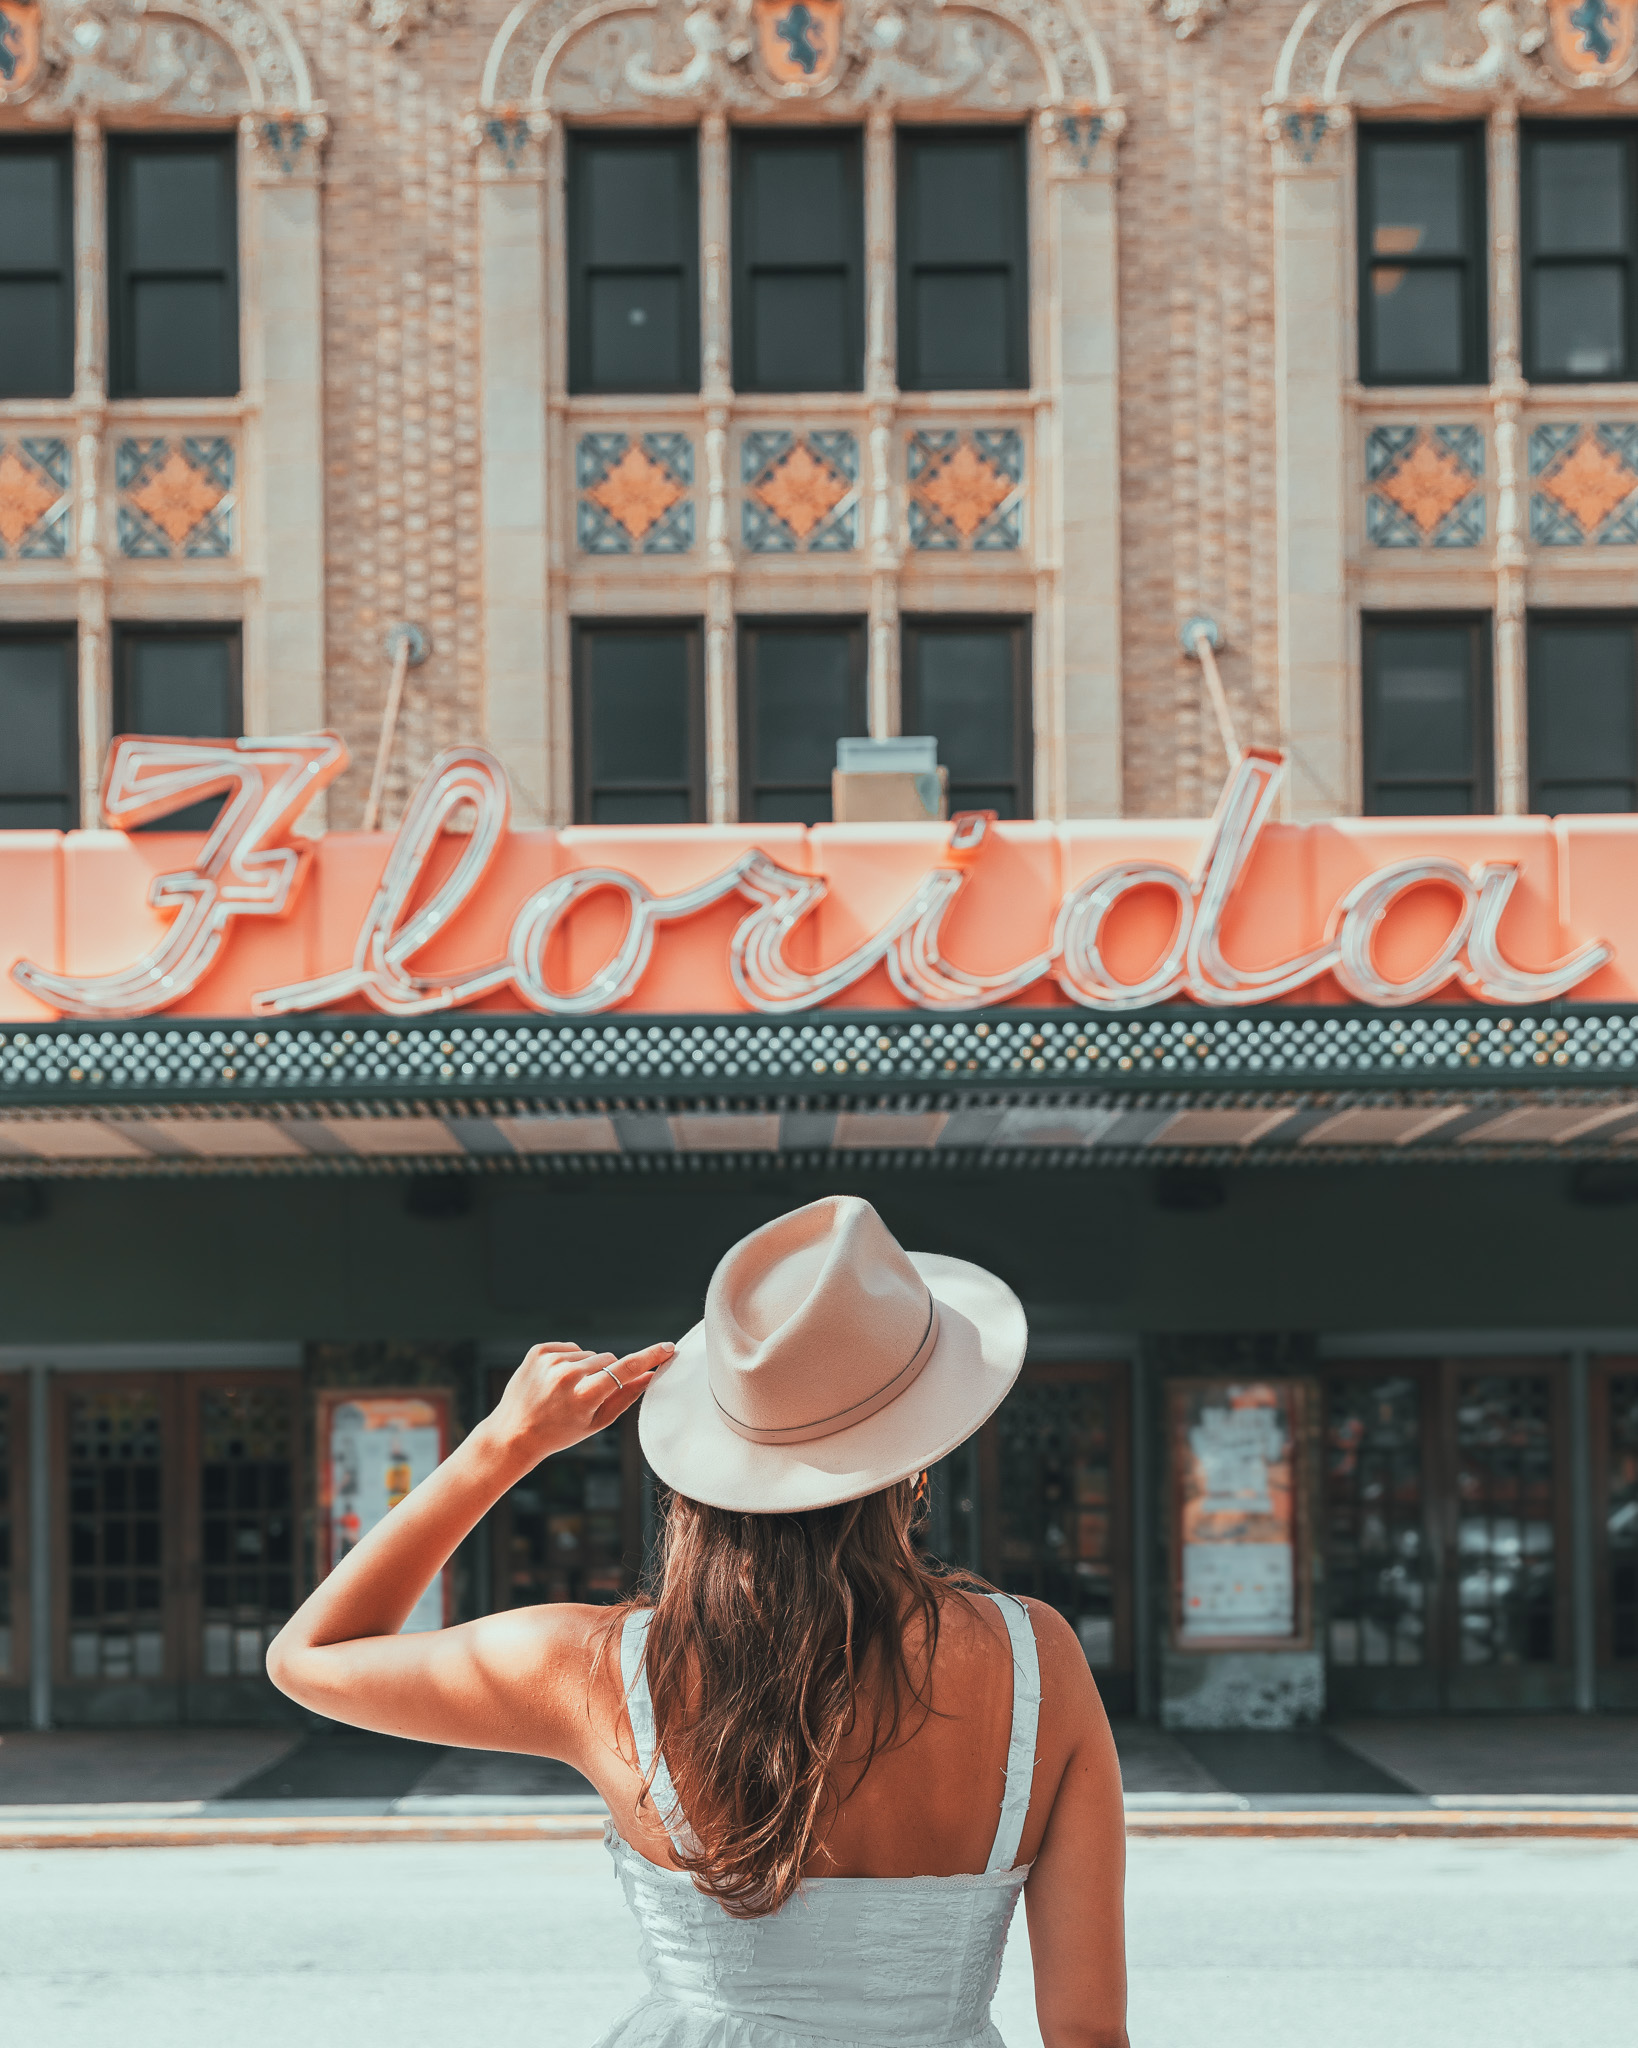 Top Things to Do in Jacksonville, Florida ~ #readysetjetset #florida #jax #jacksonville #blogpost #travel